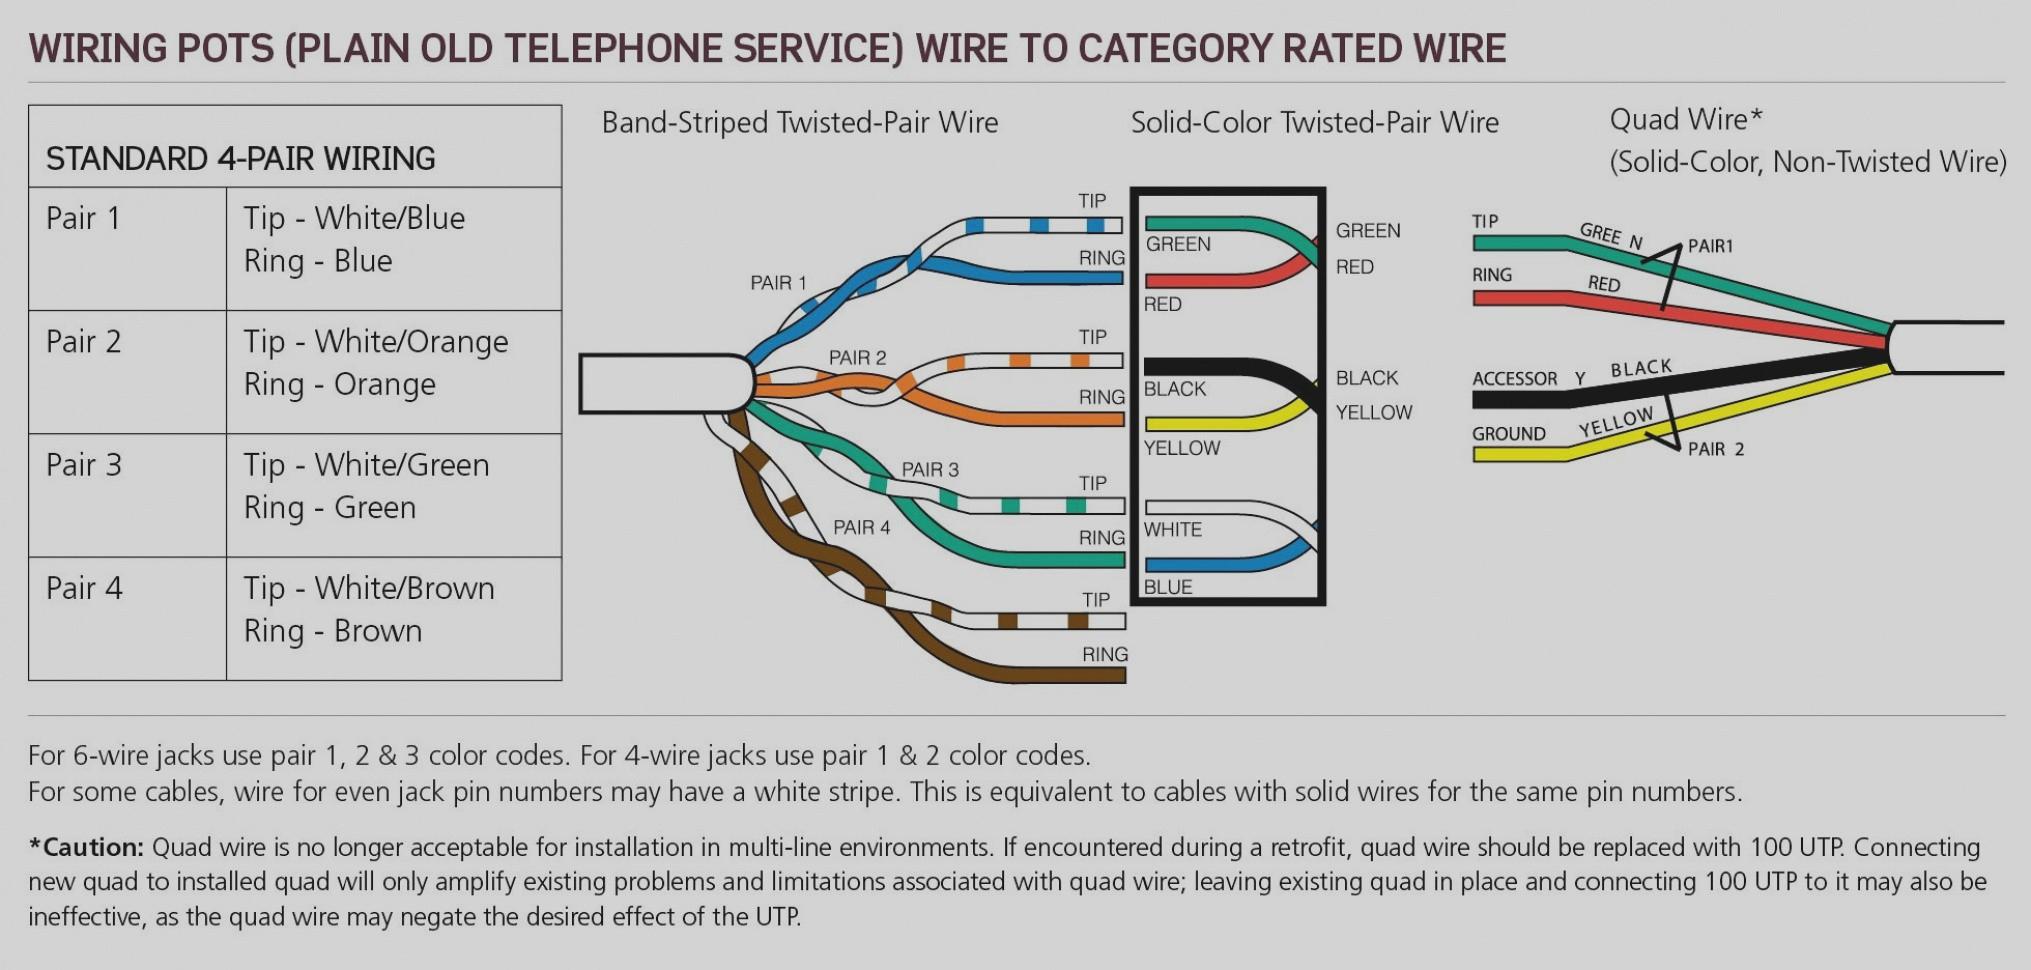 Telephone Line Wiring Diagram - Wiring Diagrams Hubs - Aux Cord Wiring Diagram